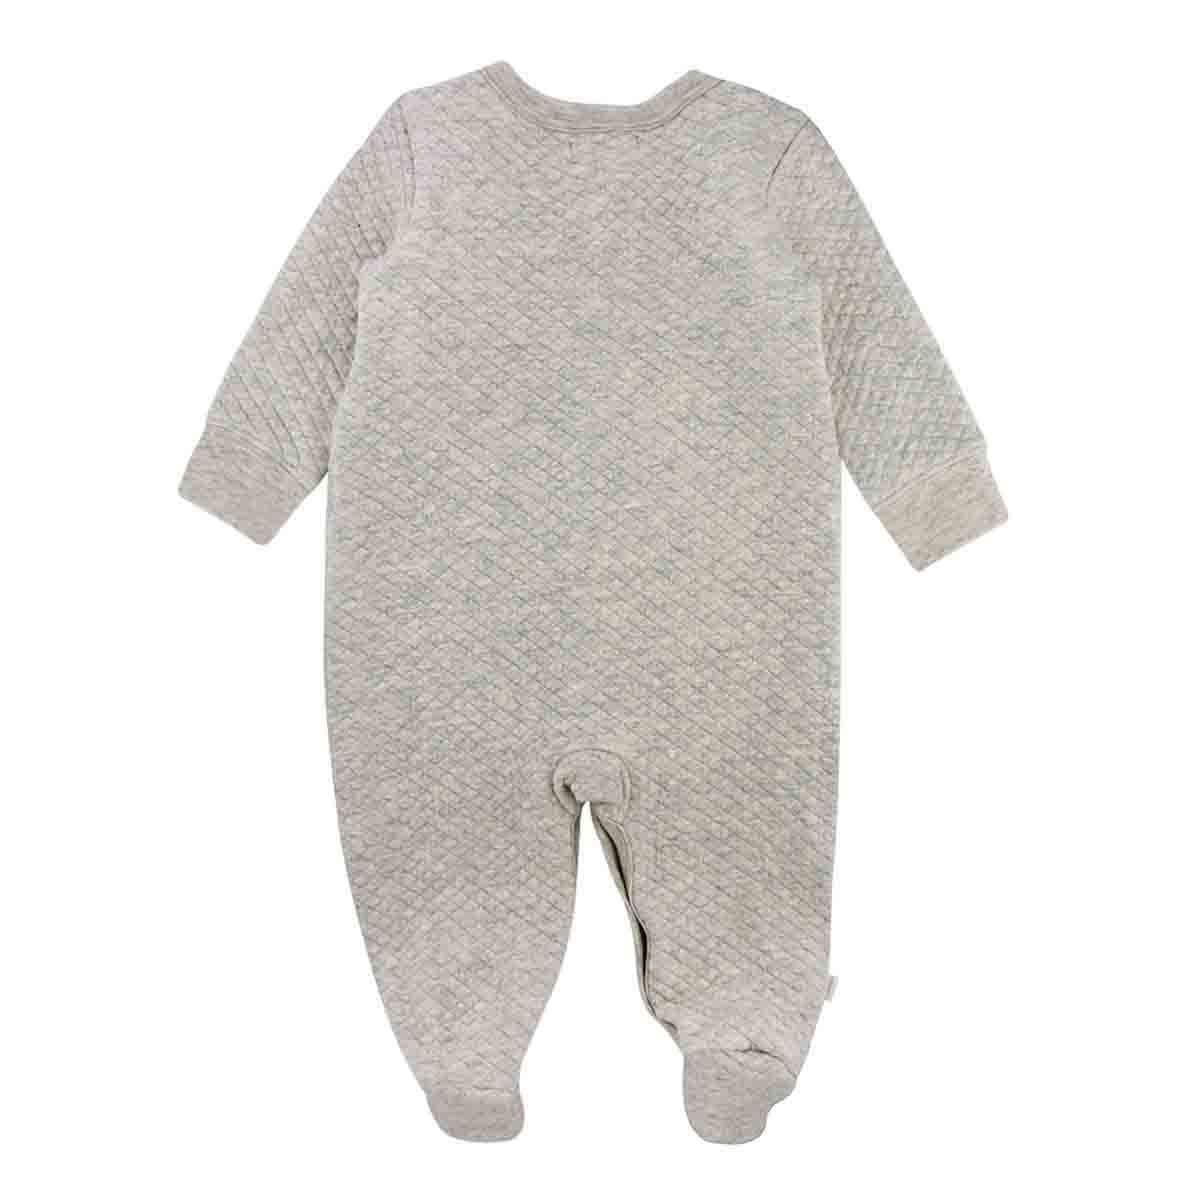 Mameluco Capitonado Baby Creysi Collection